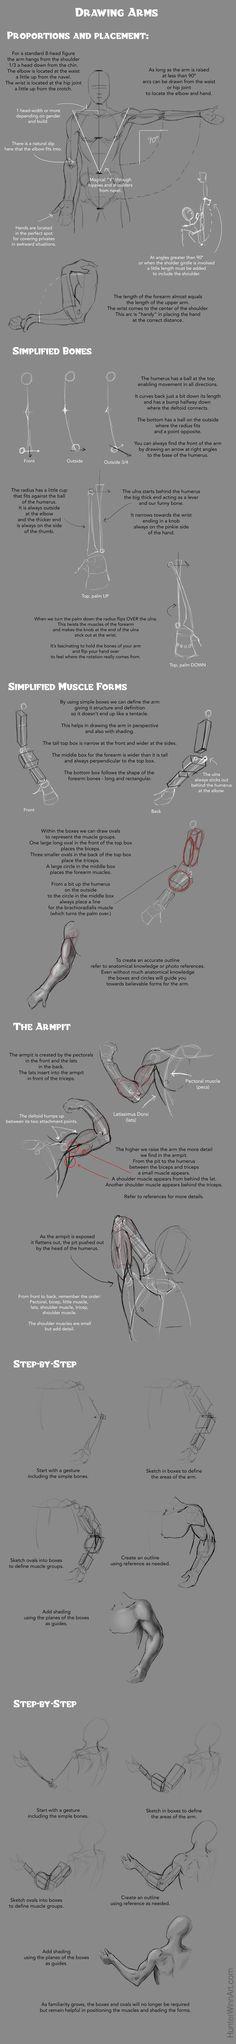 Drawing Arms Tutorial by HJWinn.deviantart.com on @DeviantArt